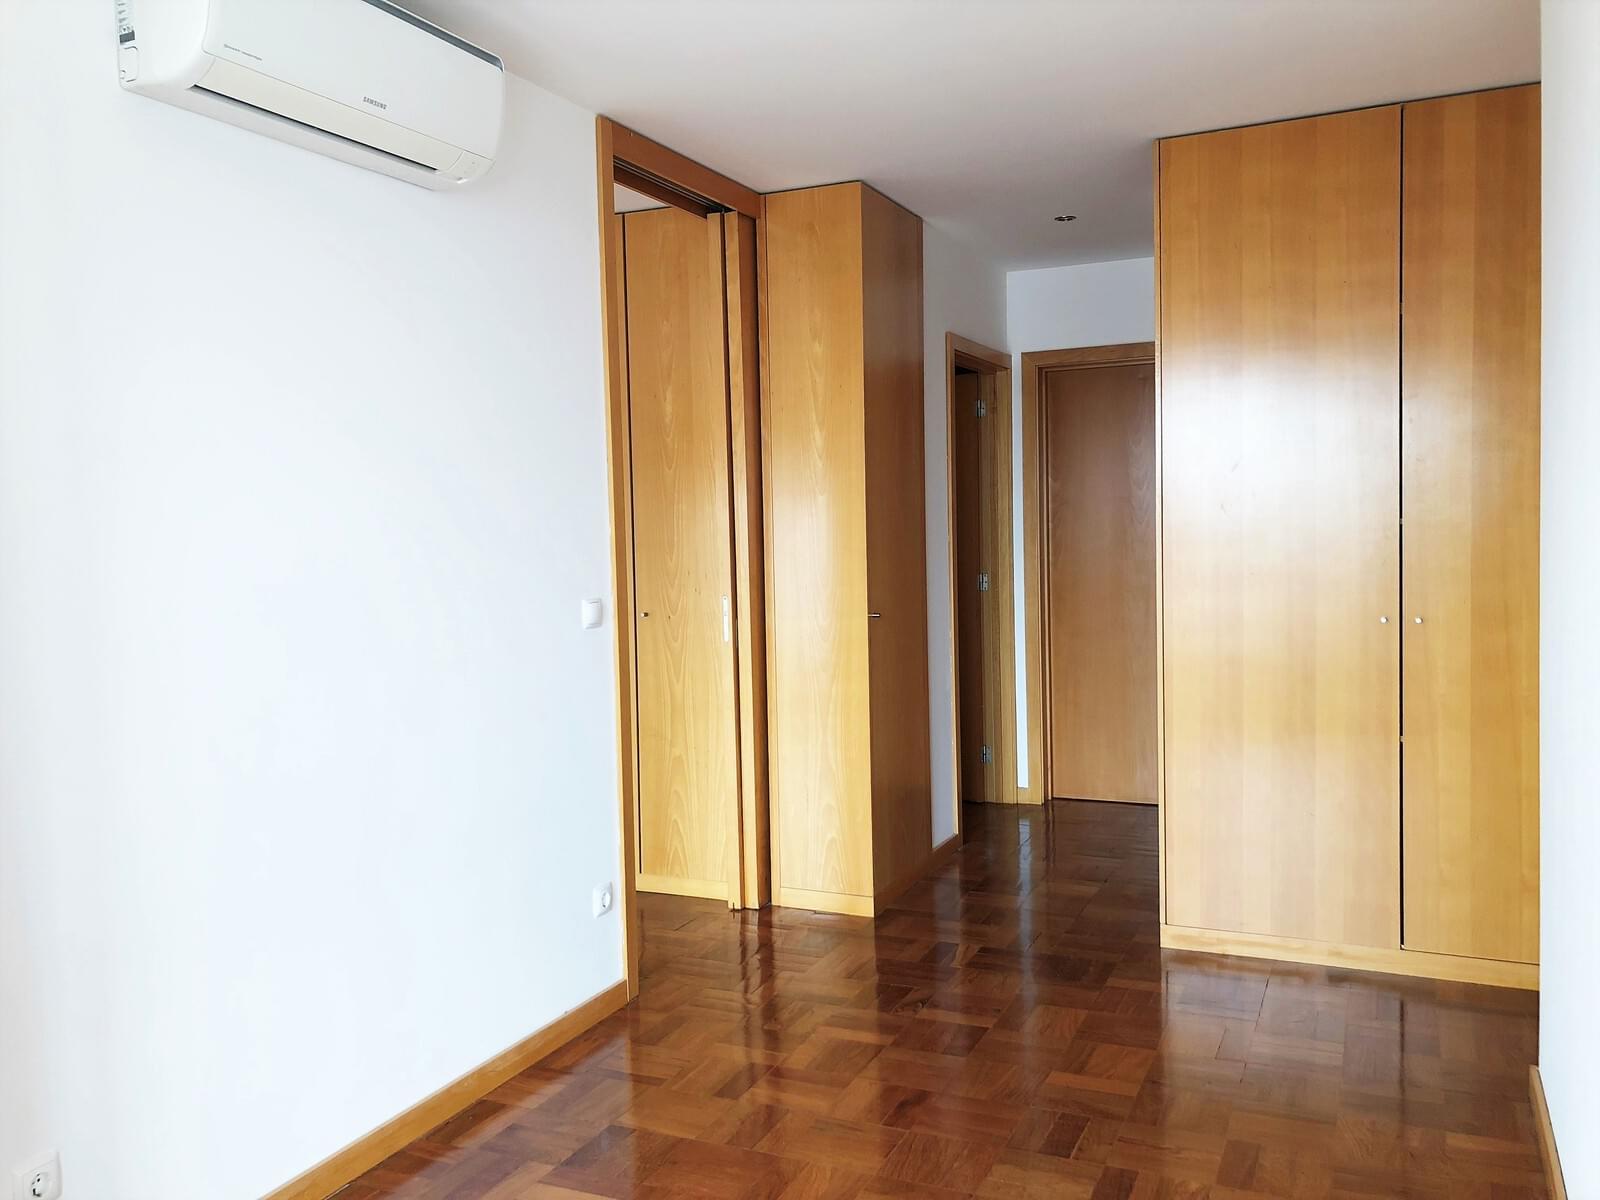 pf18040-apartamento-t3-lisboa-ea1f3c2a-c972-49c5-bbc4-095308aa6aa5